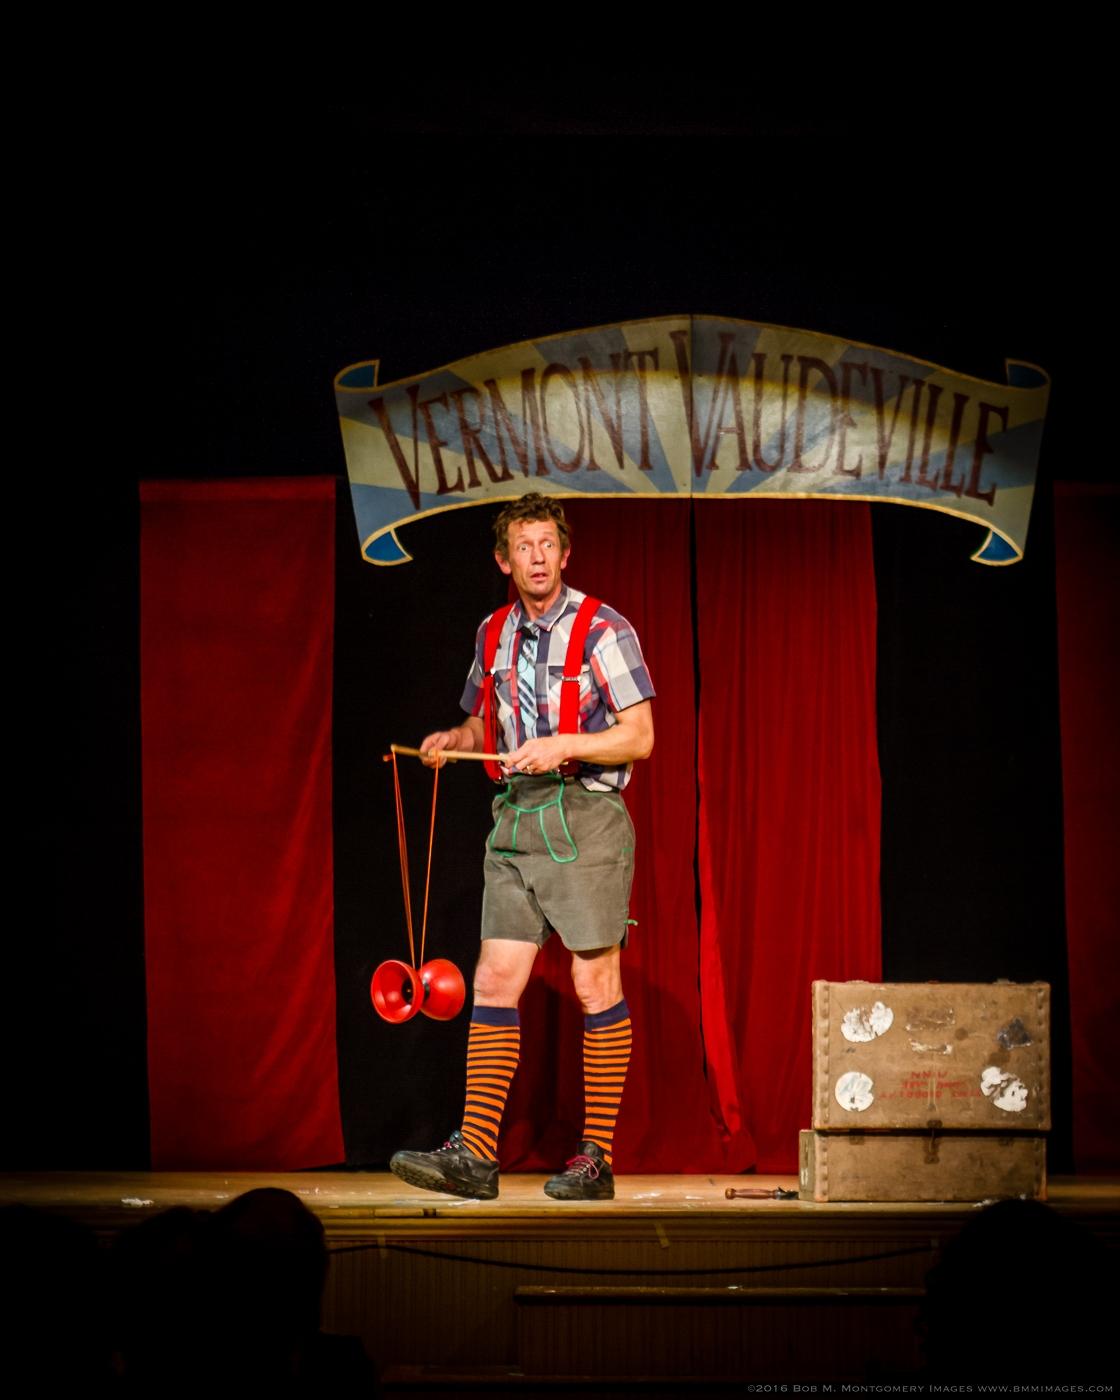 Vermont Vaudeville 20160513 - 0098.jpg